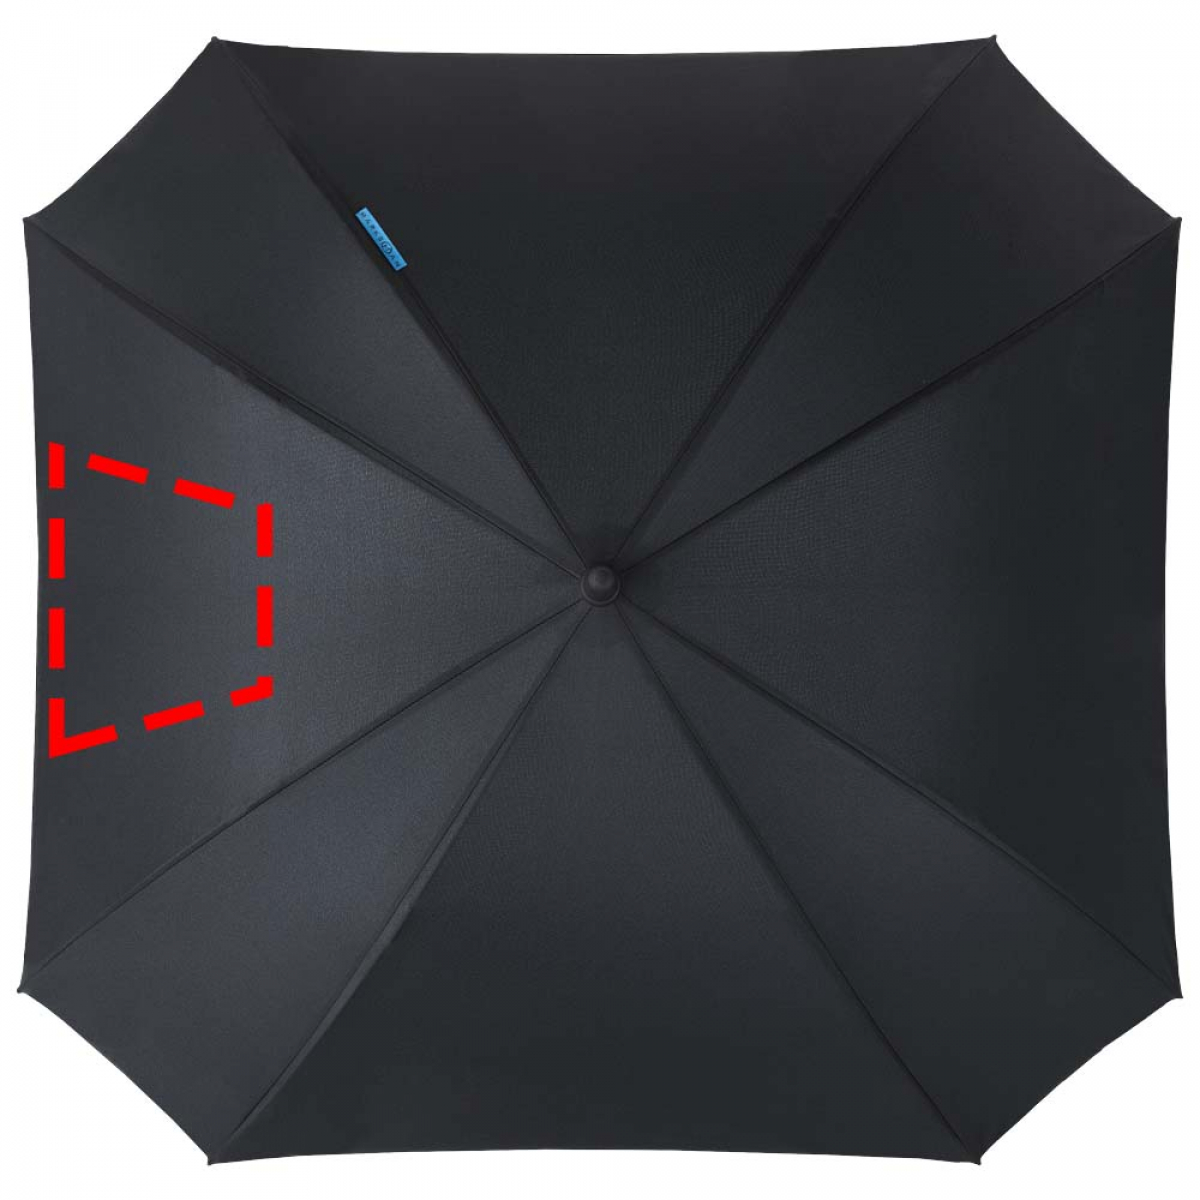 Vierkante paraplu dubbellaags